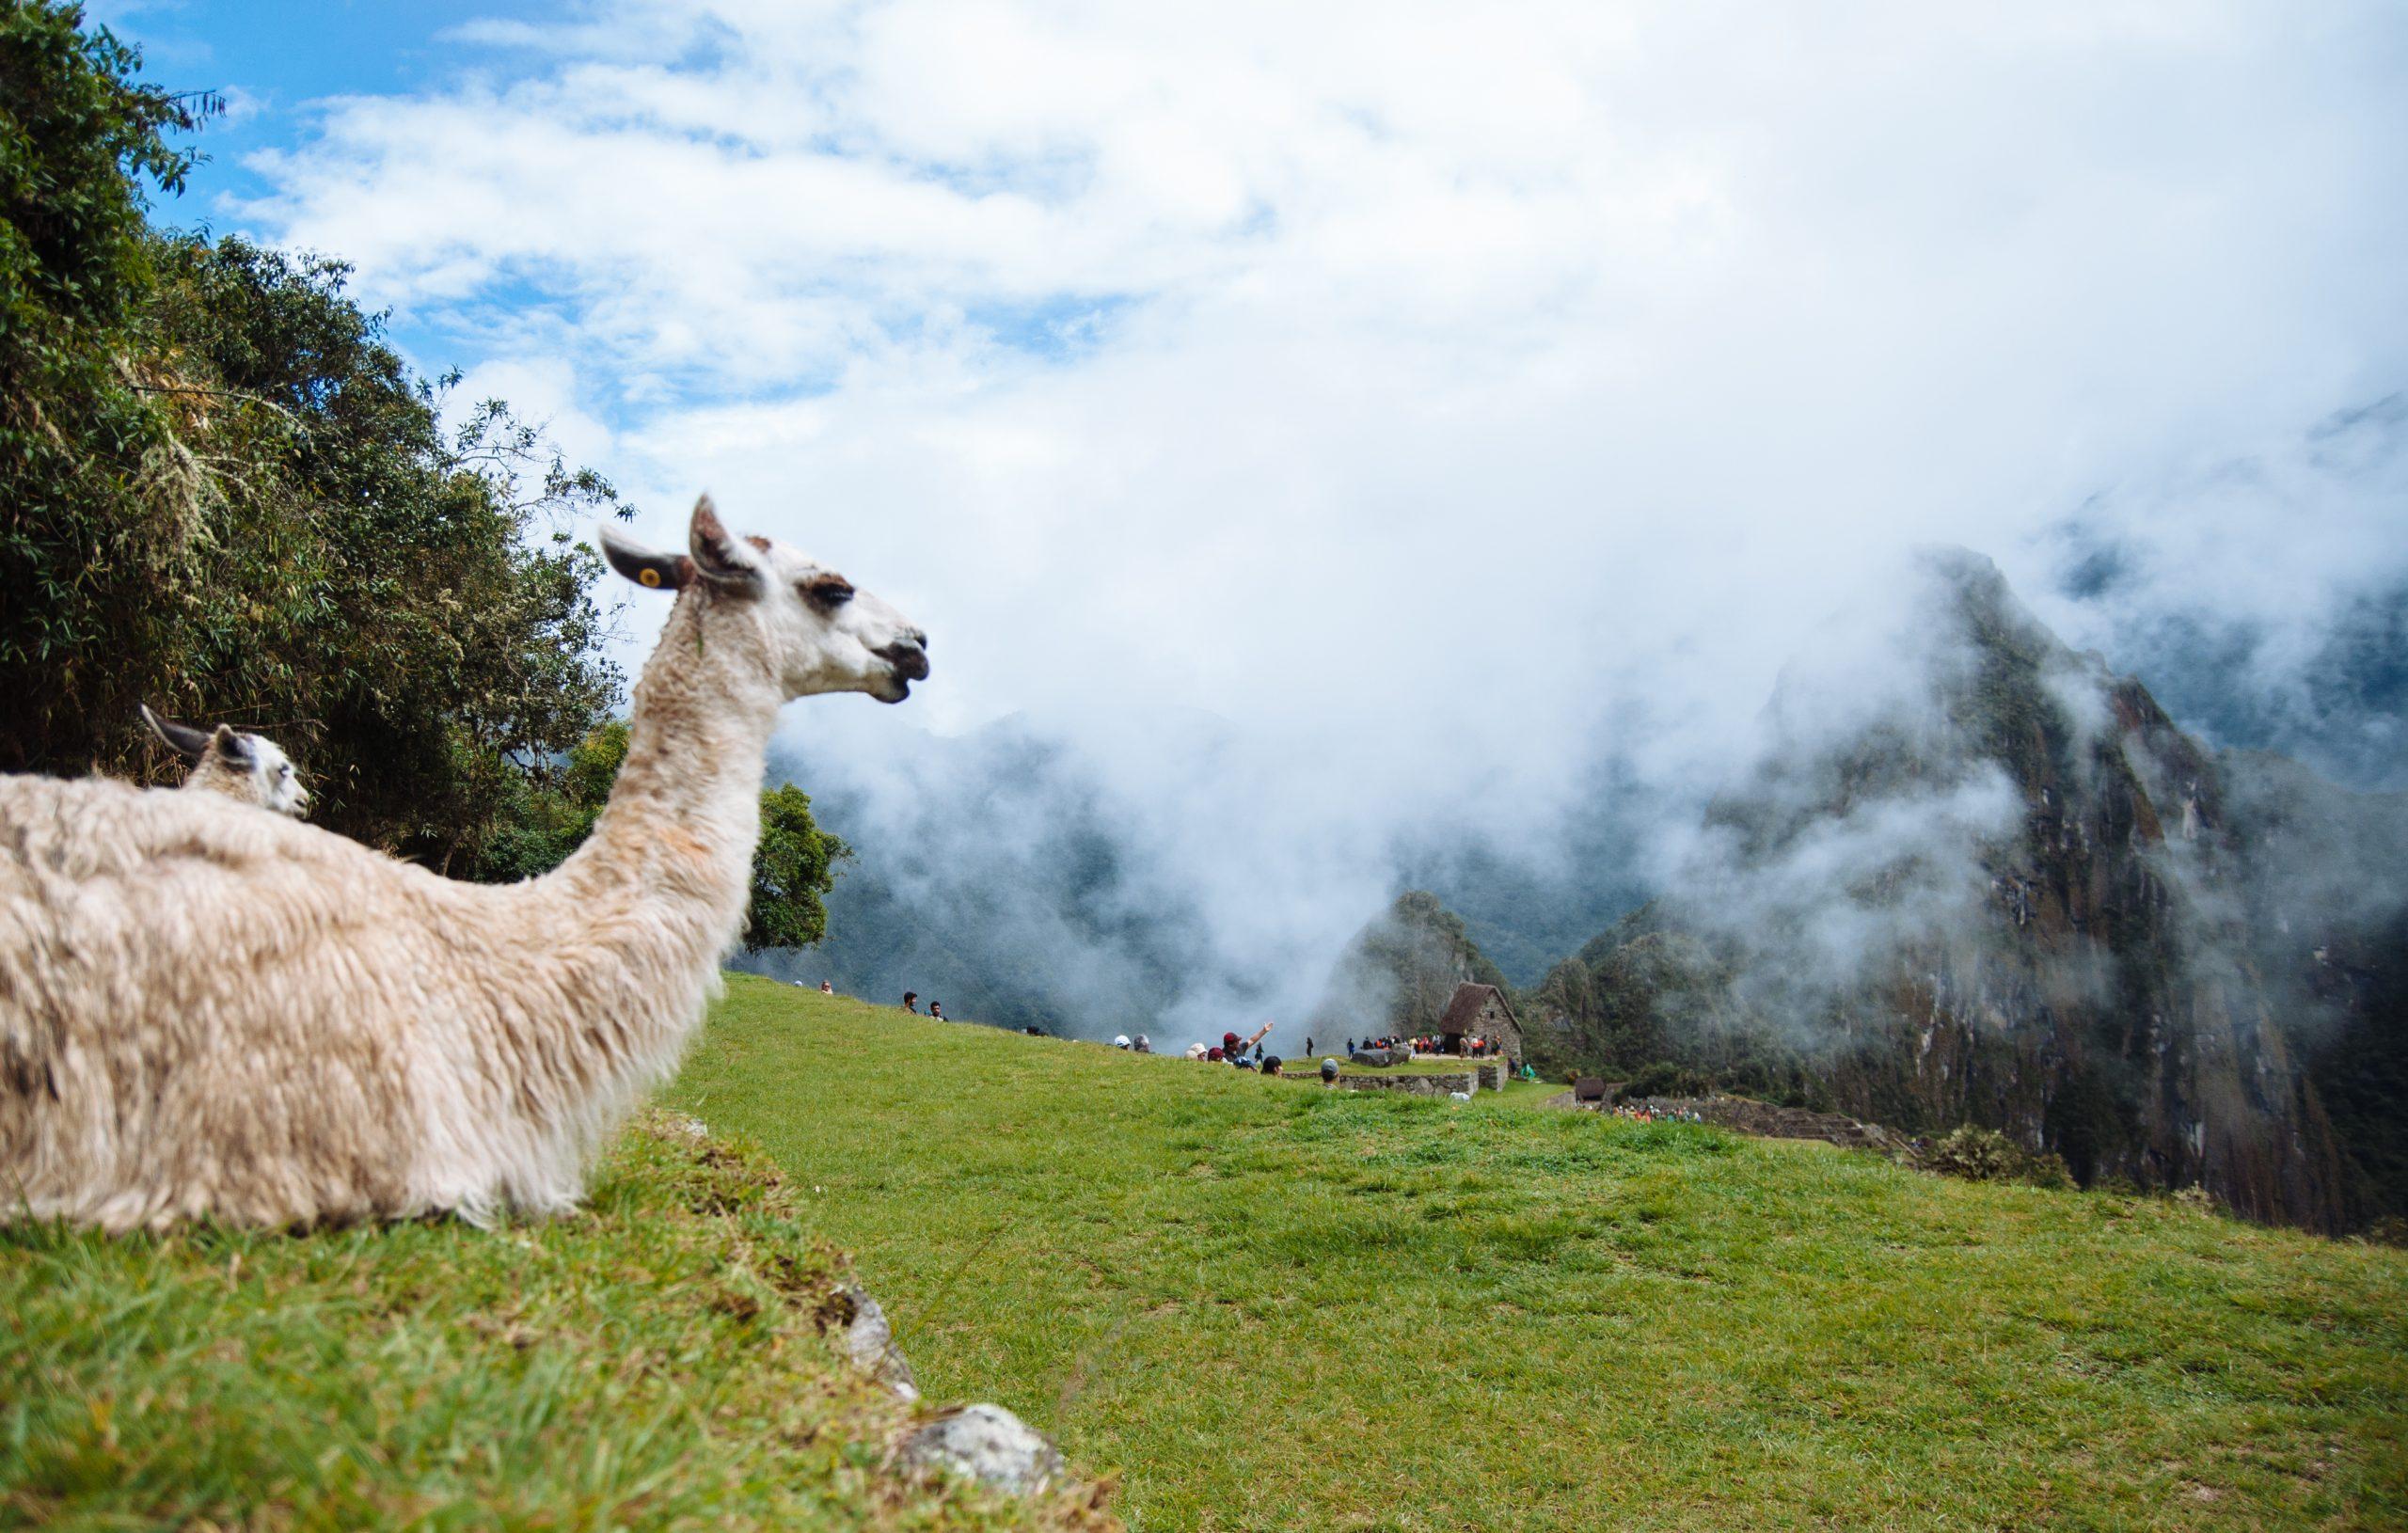 Huayna Picchu, Peru (Credit: Colin Roohan)